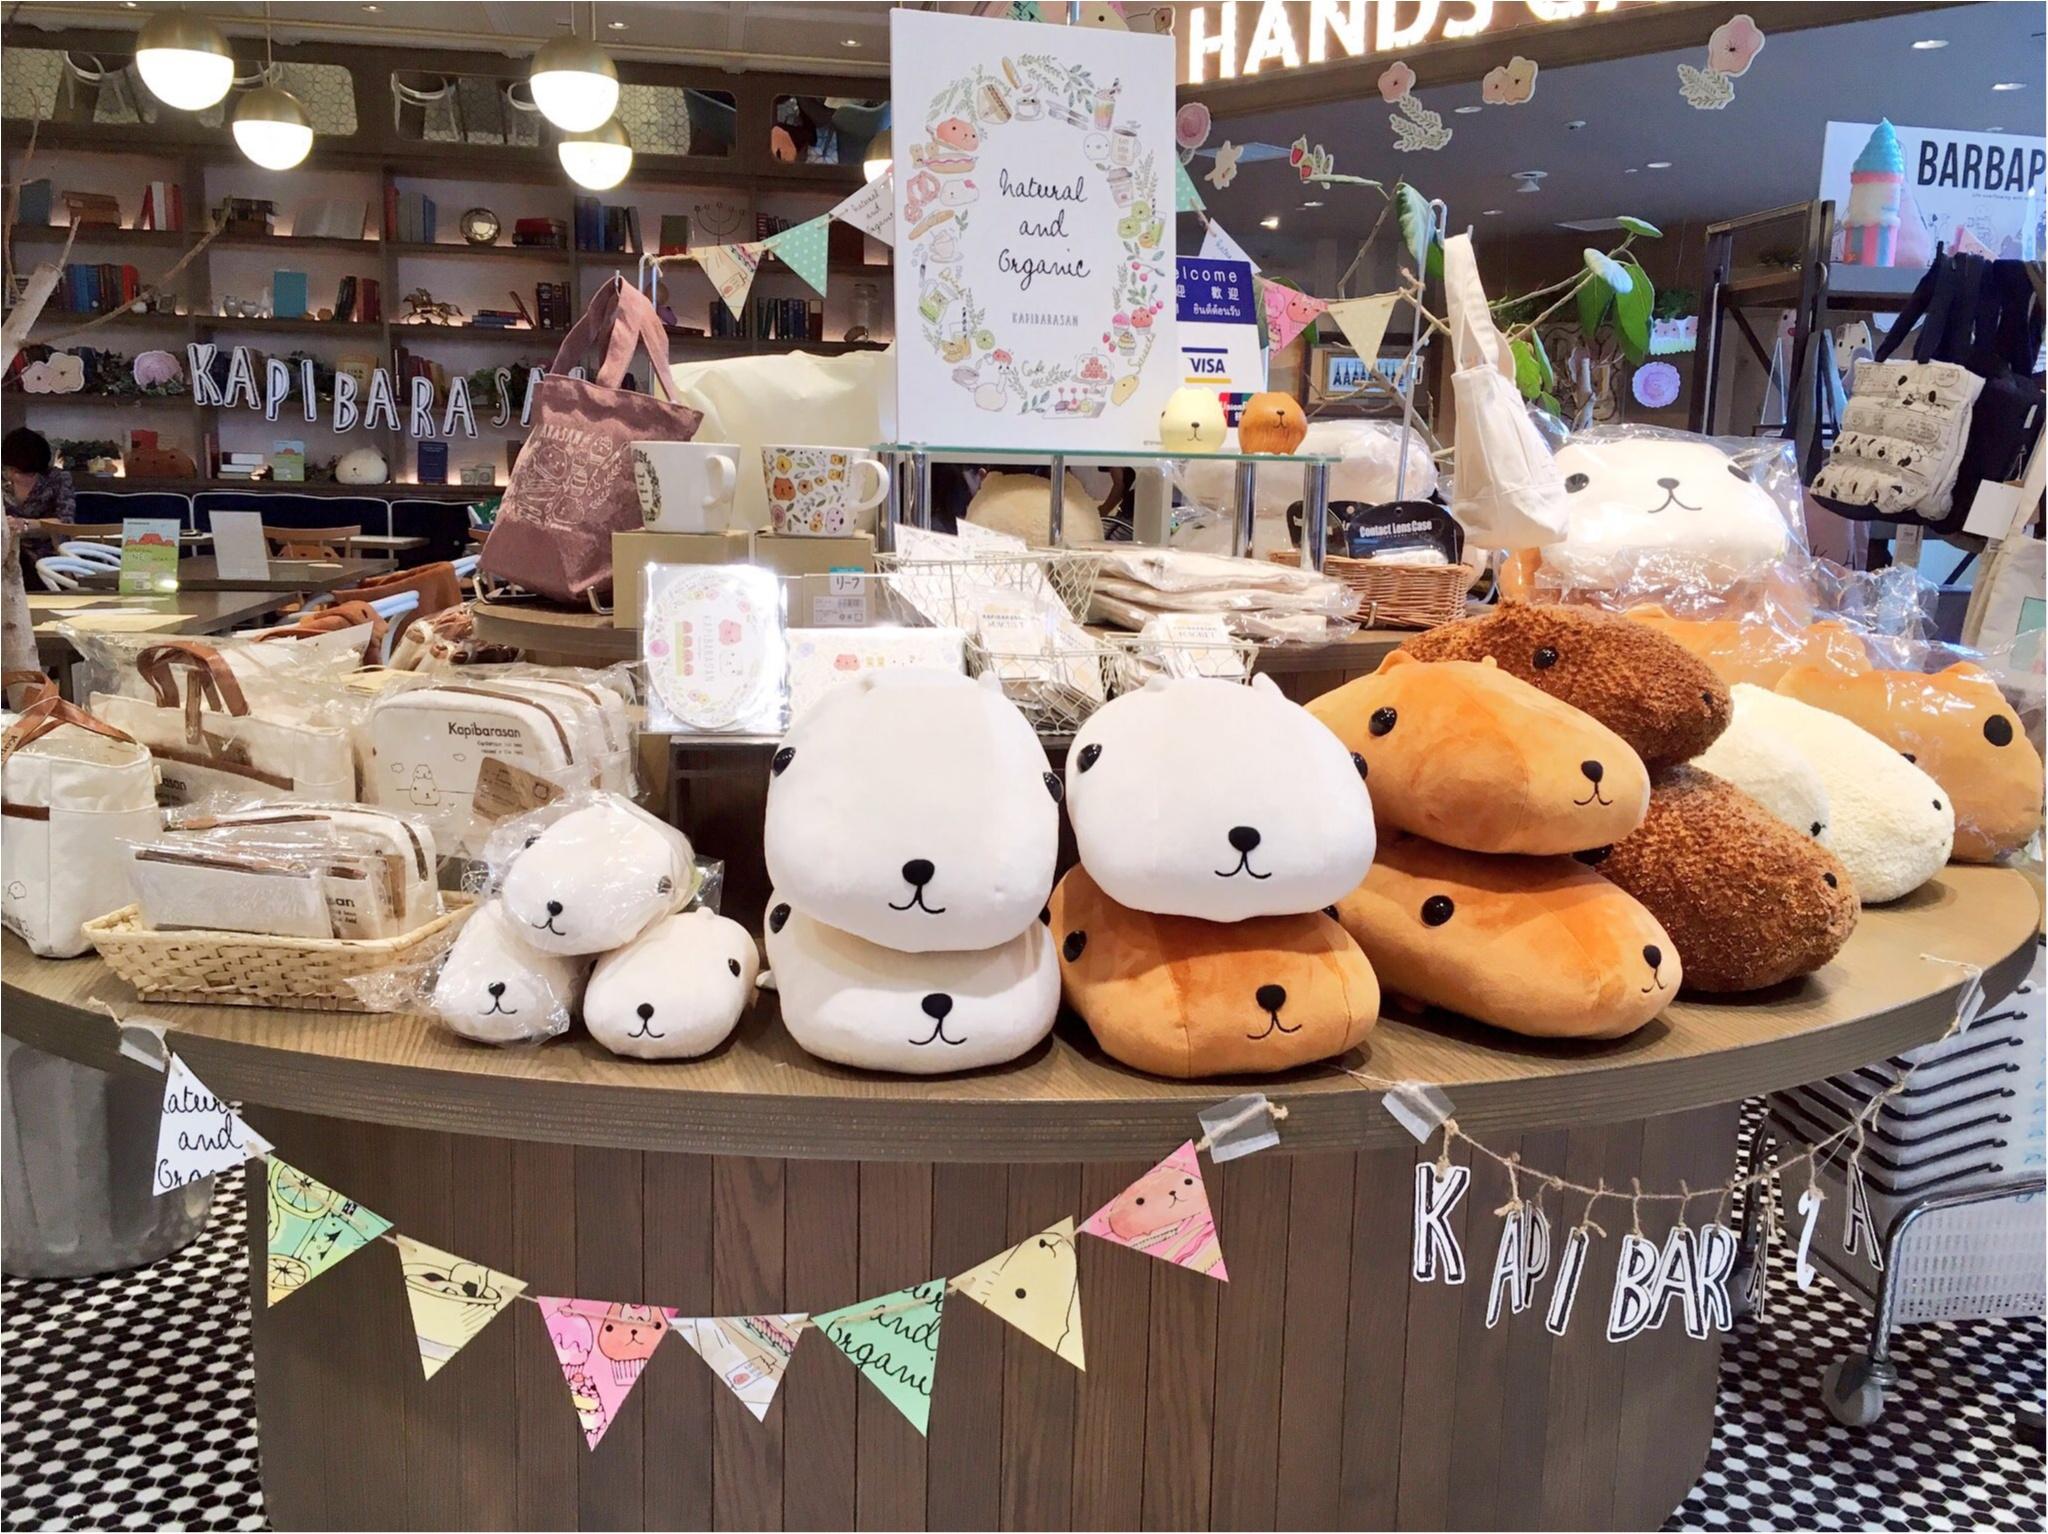 『KAPIBARASAN×HANDS CAFE』@東急表参道原宿店♡りぃイチオシメニューのご紹介(∗•ω•∗)♡_3